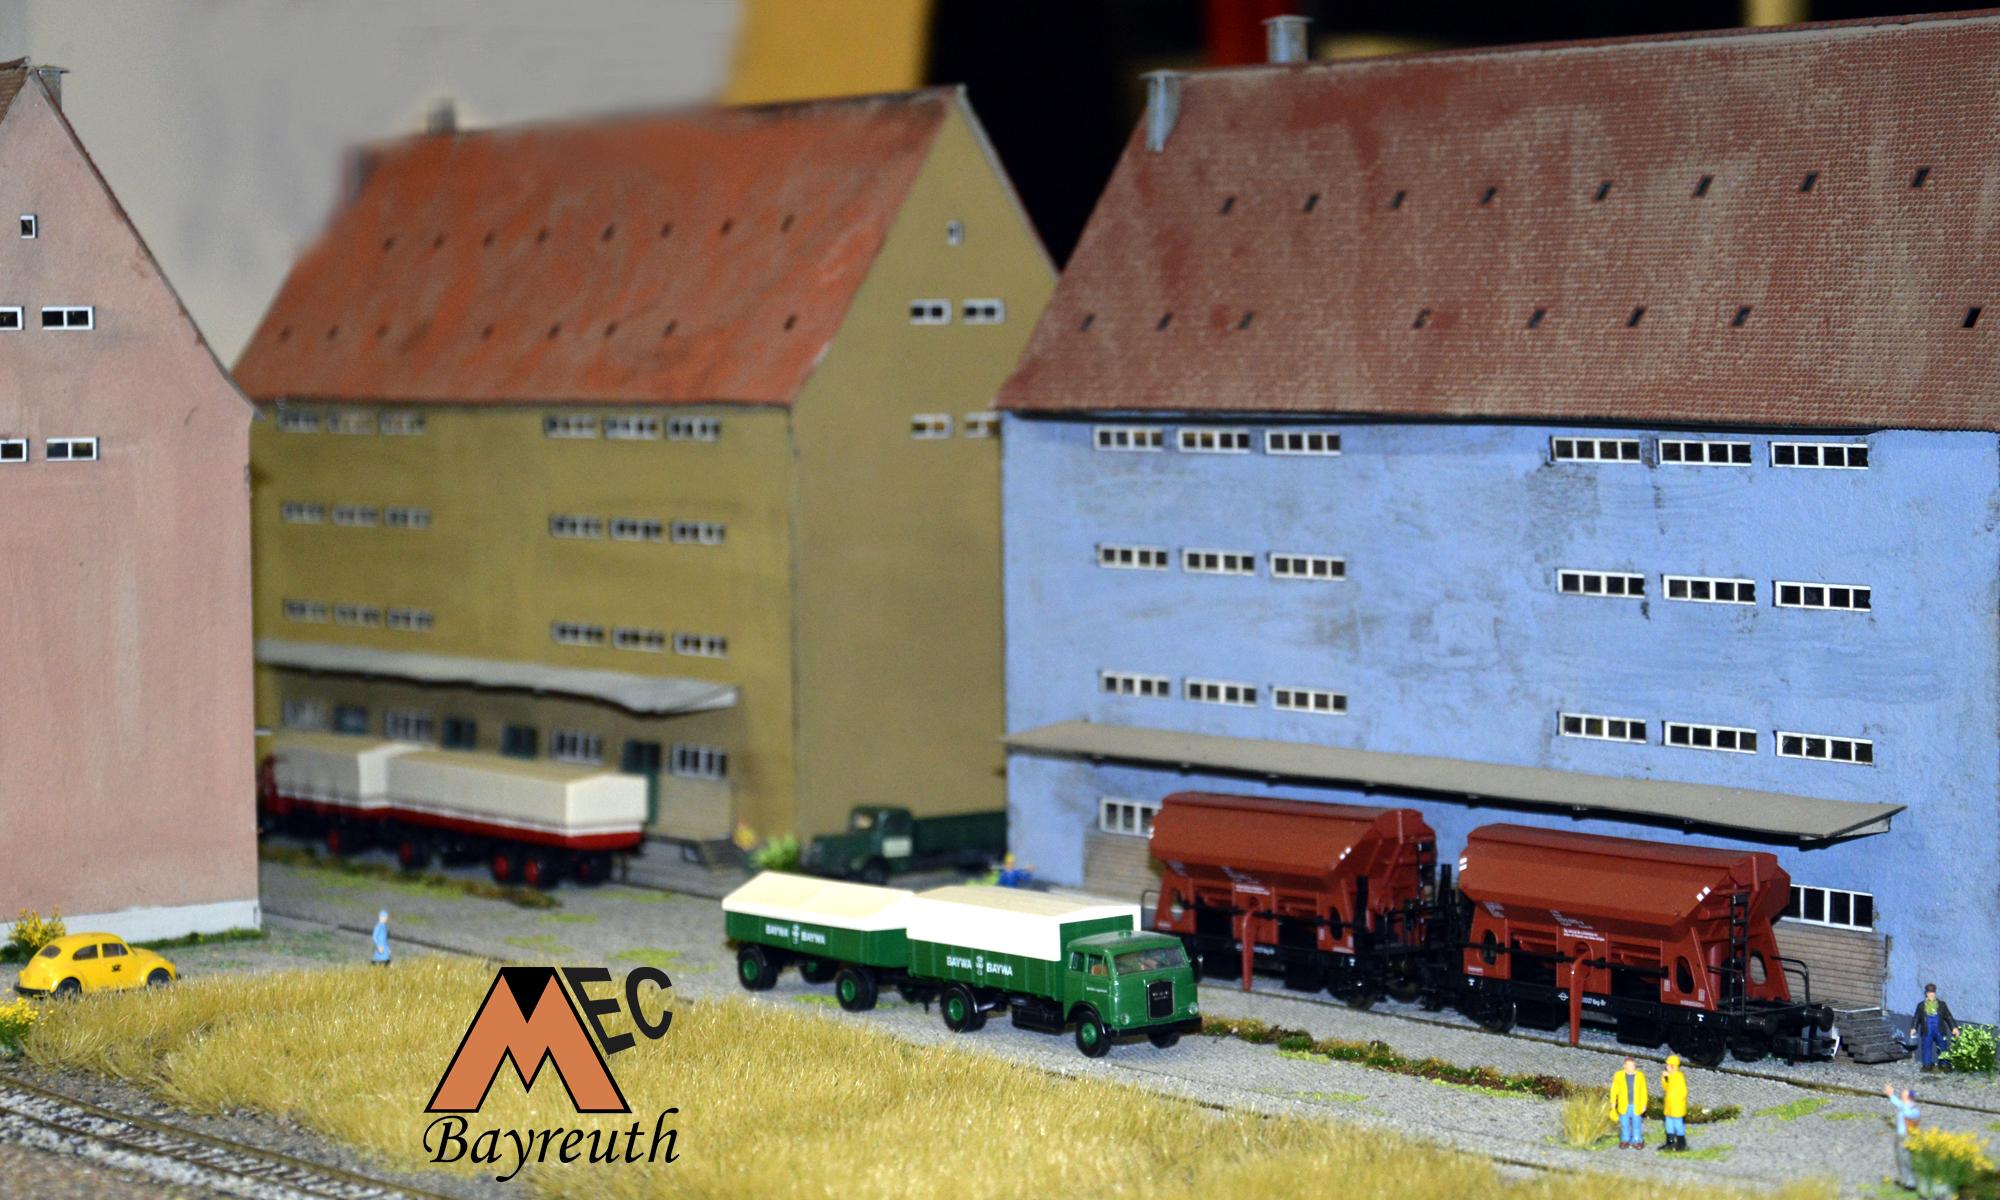 MEC Bayreuth